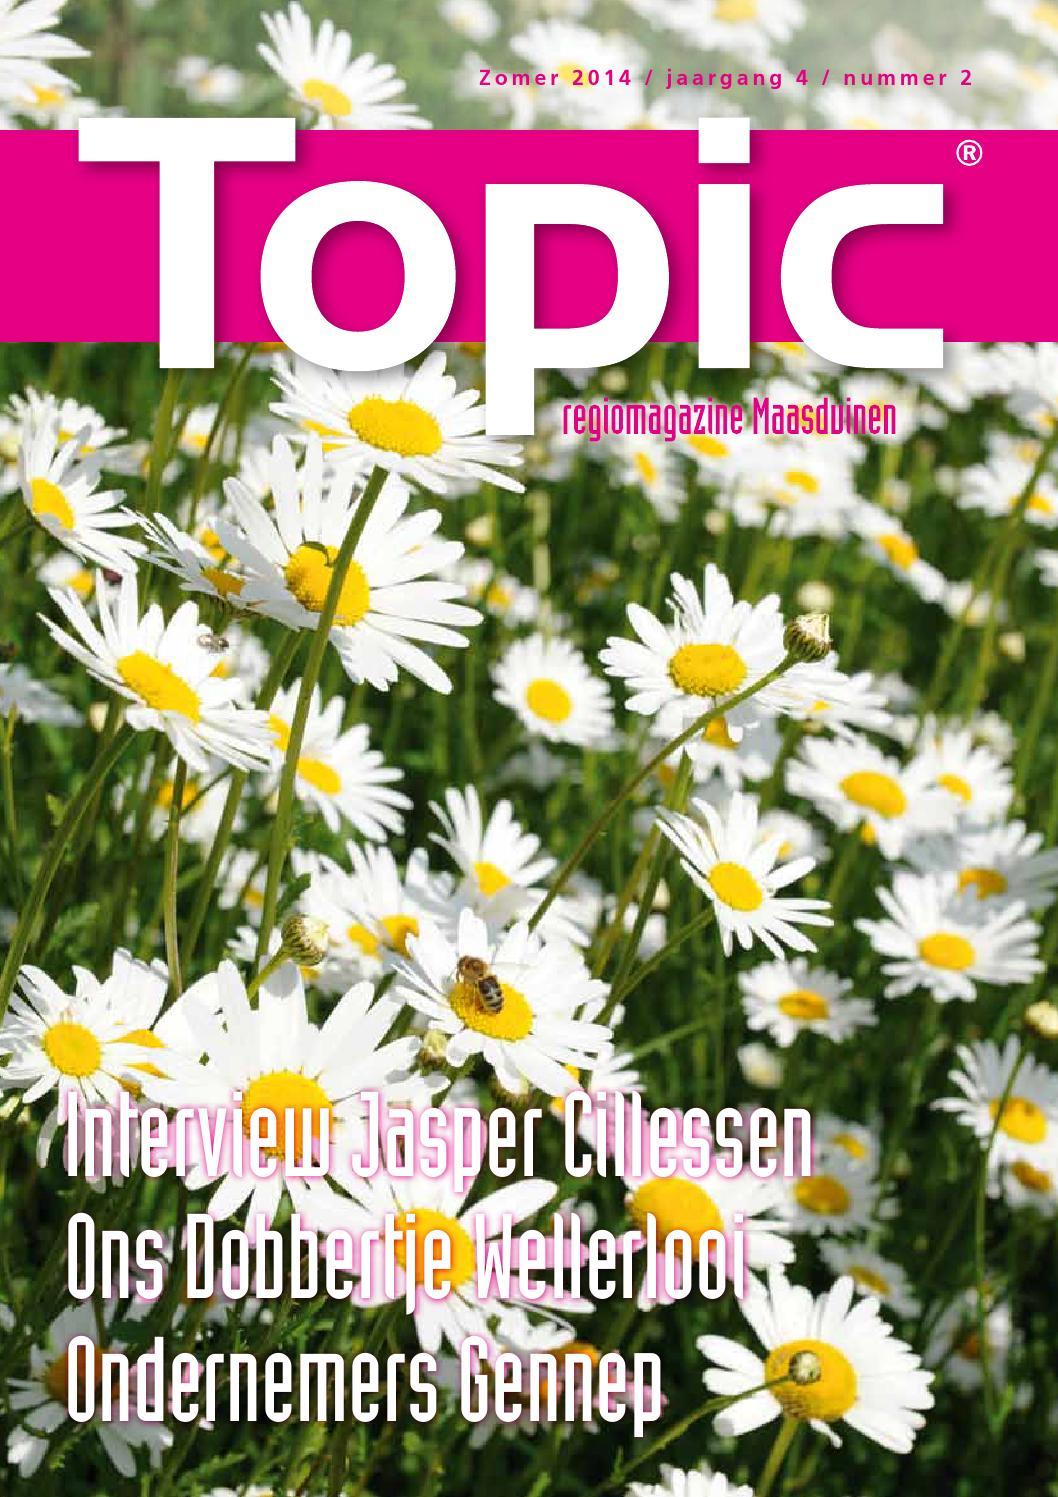 Topic maasduinen zomer 2014 by rvb media issuu for Vaste trap ipv vlizotrap